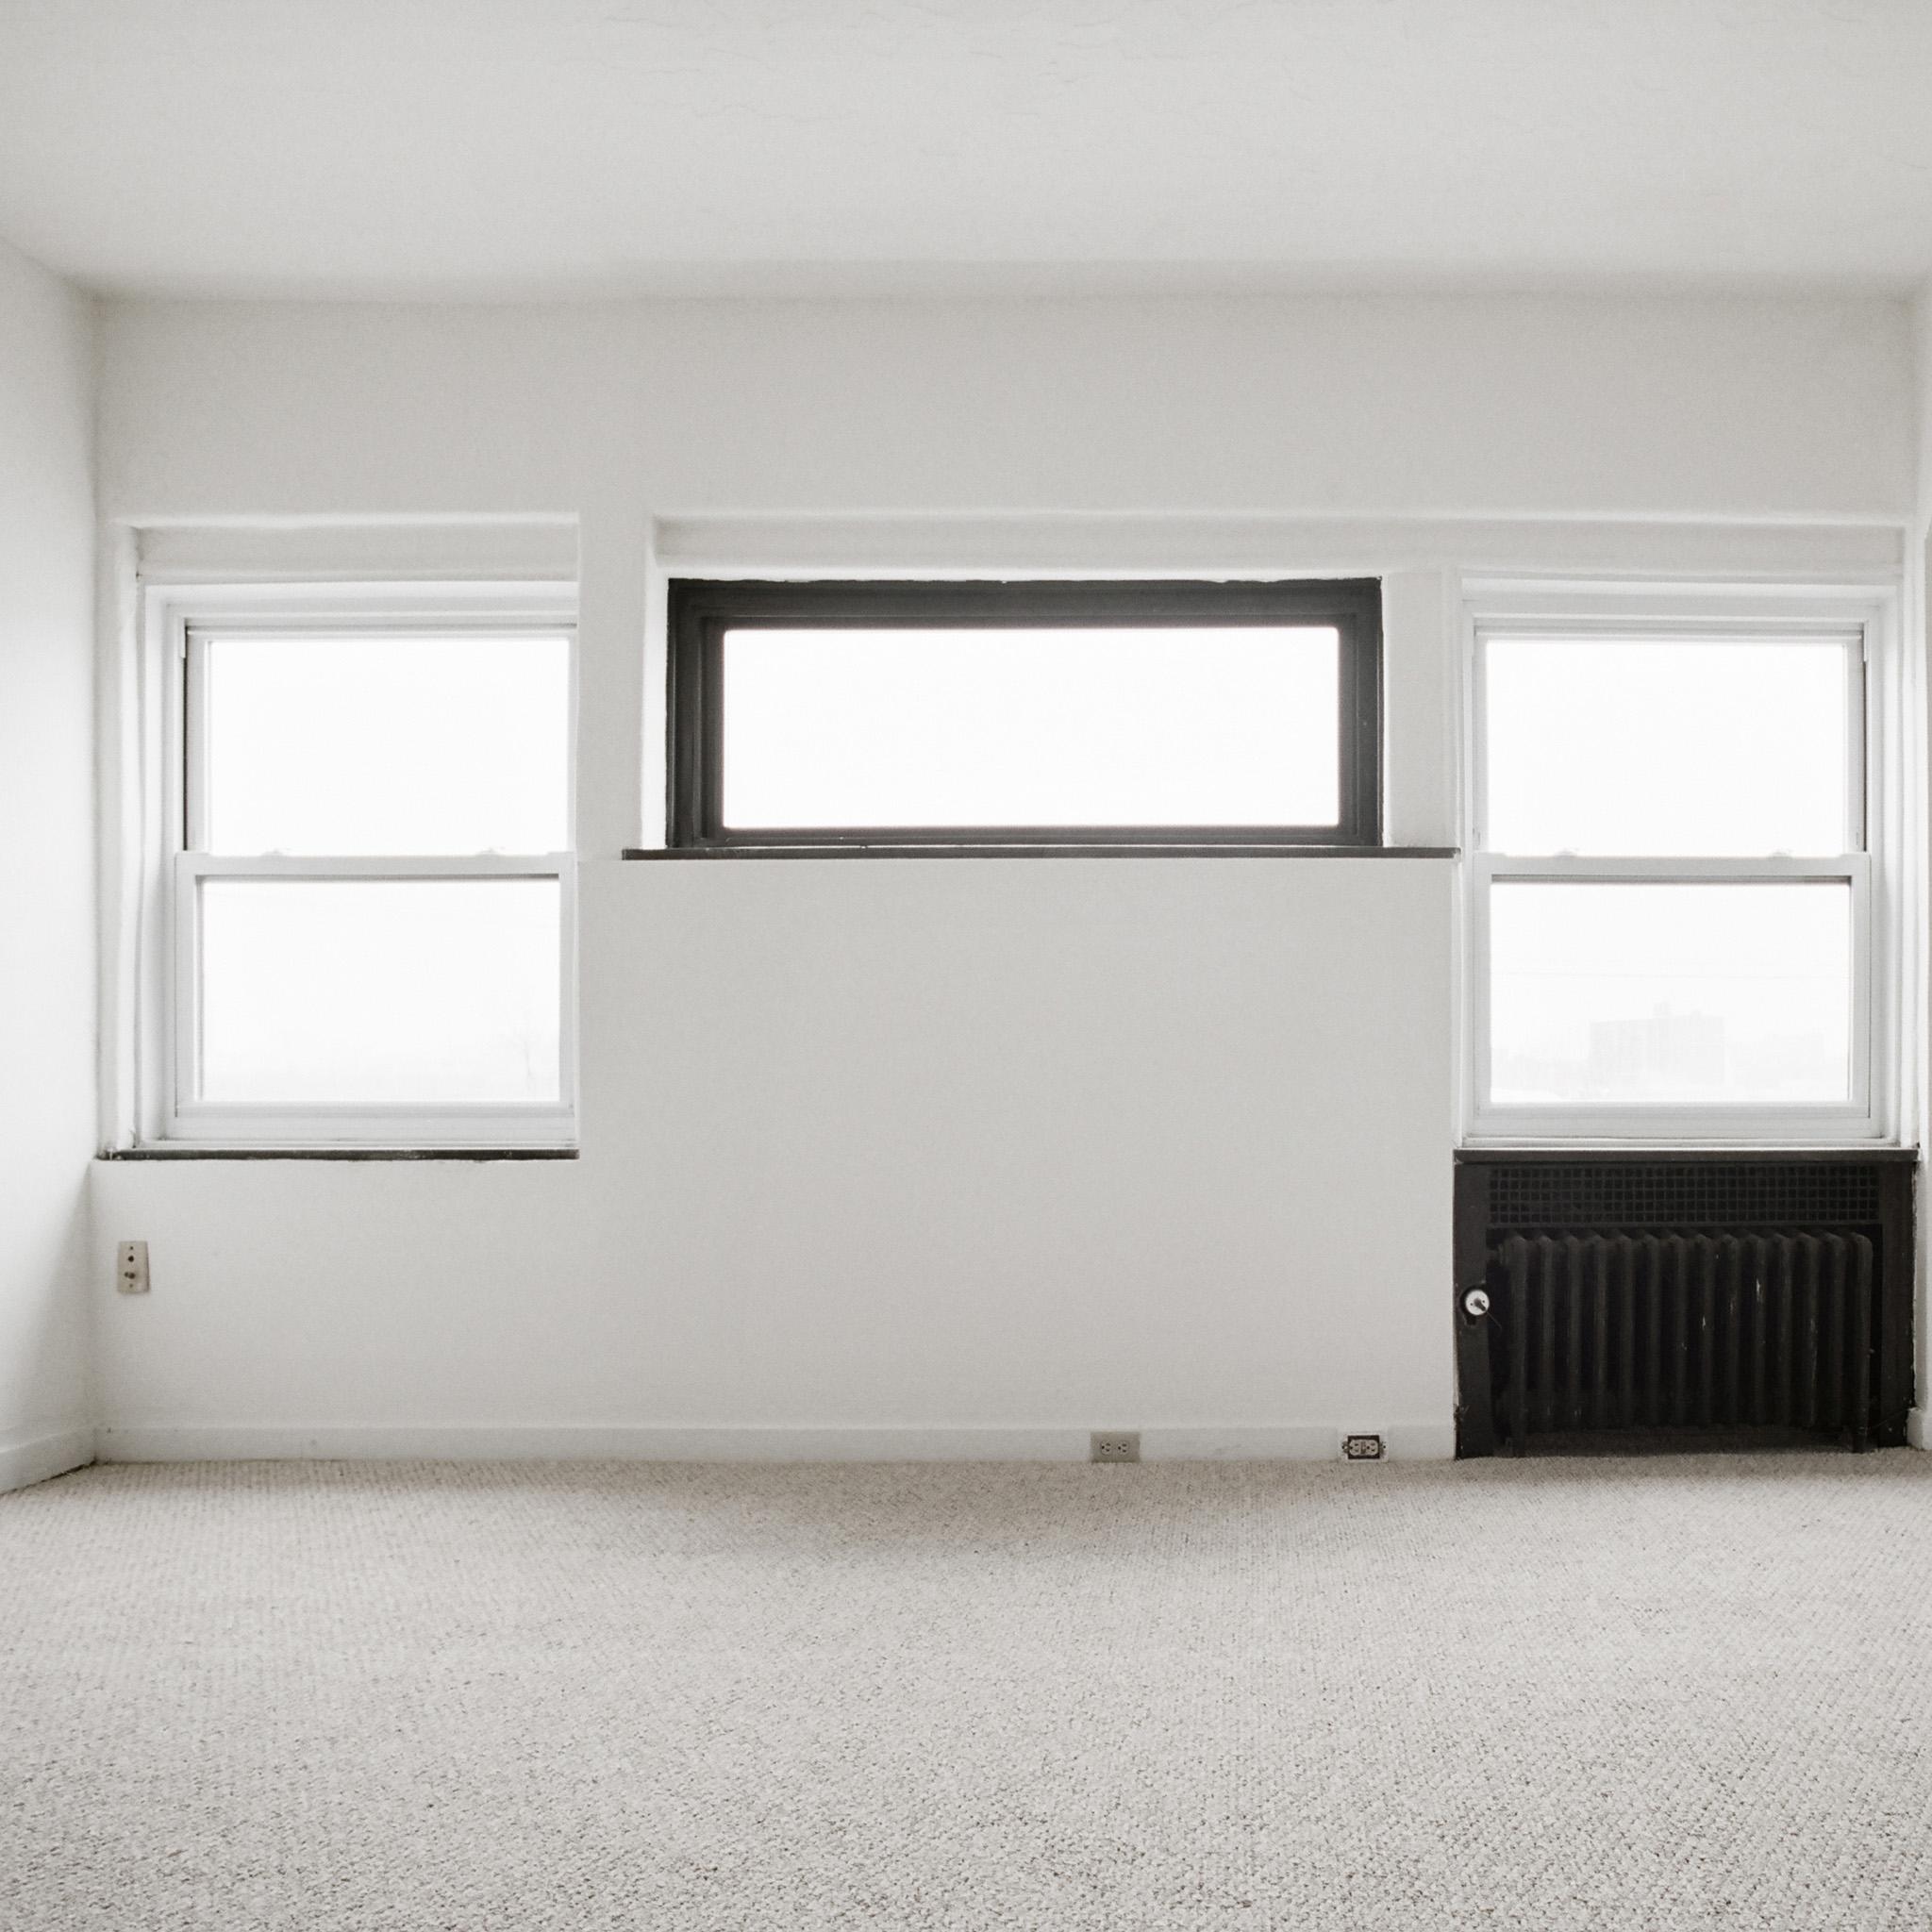 interior of 342 S. Highland Ave, Apt. 16B 4